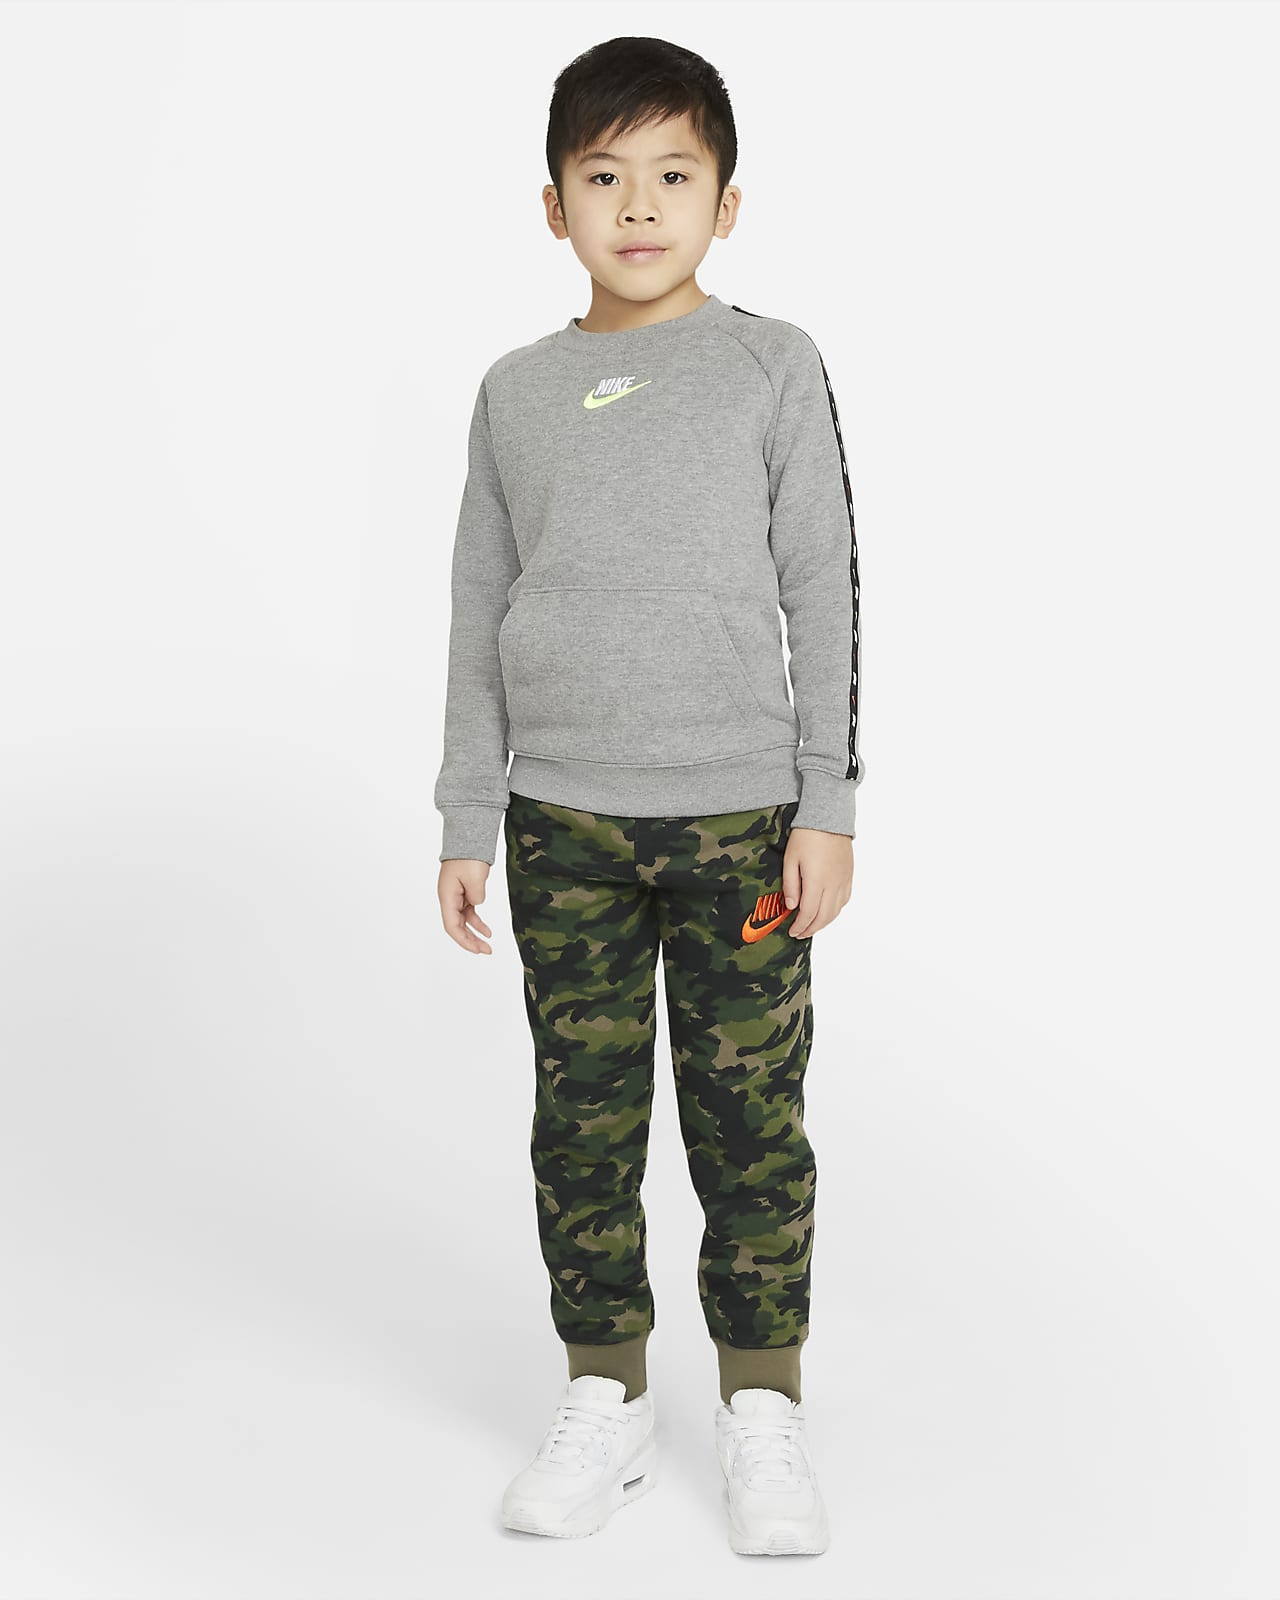 Pantalones Camuflados Para Ninos Talla Pequena Nike Nike Com